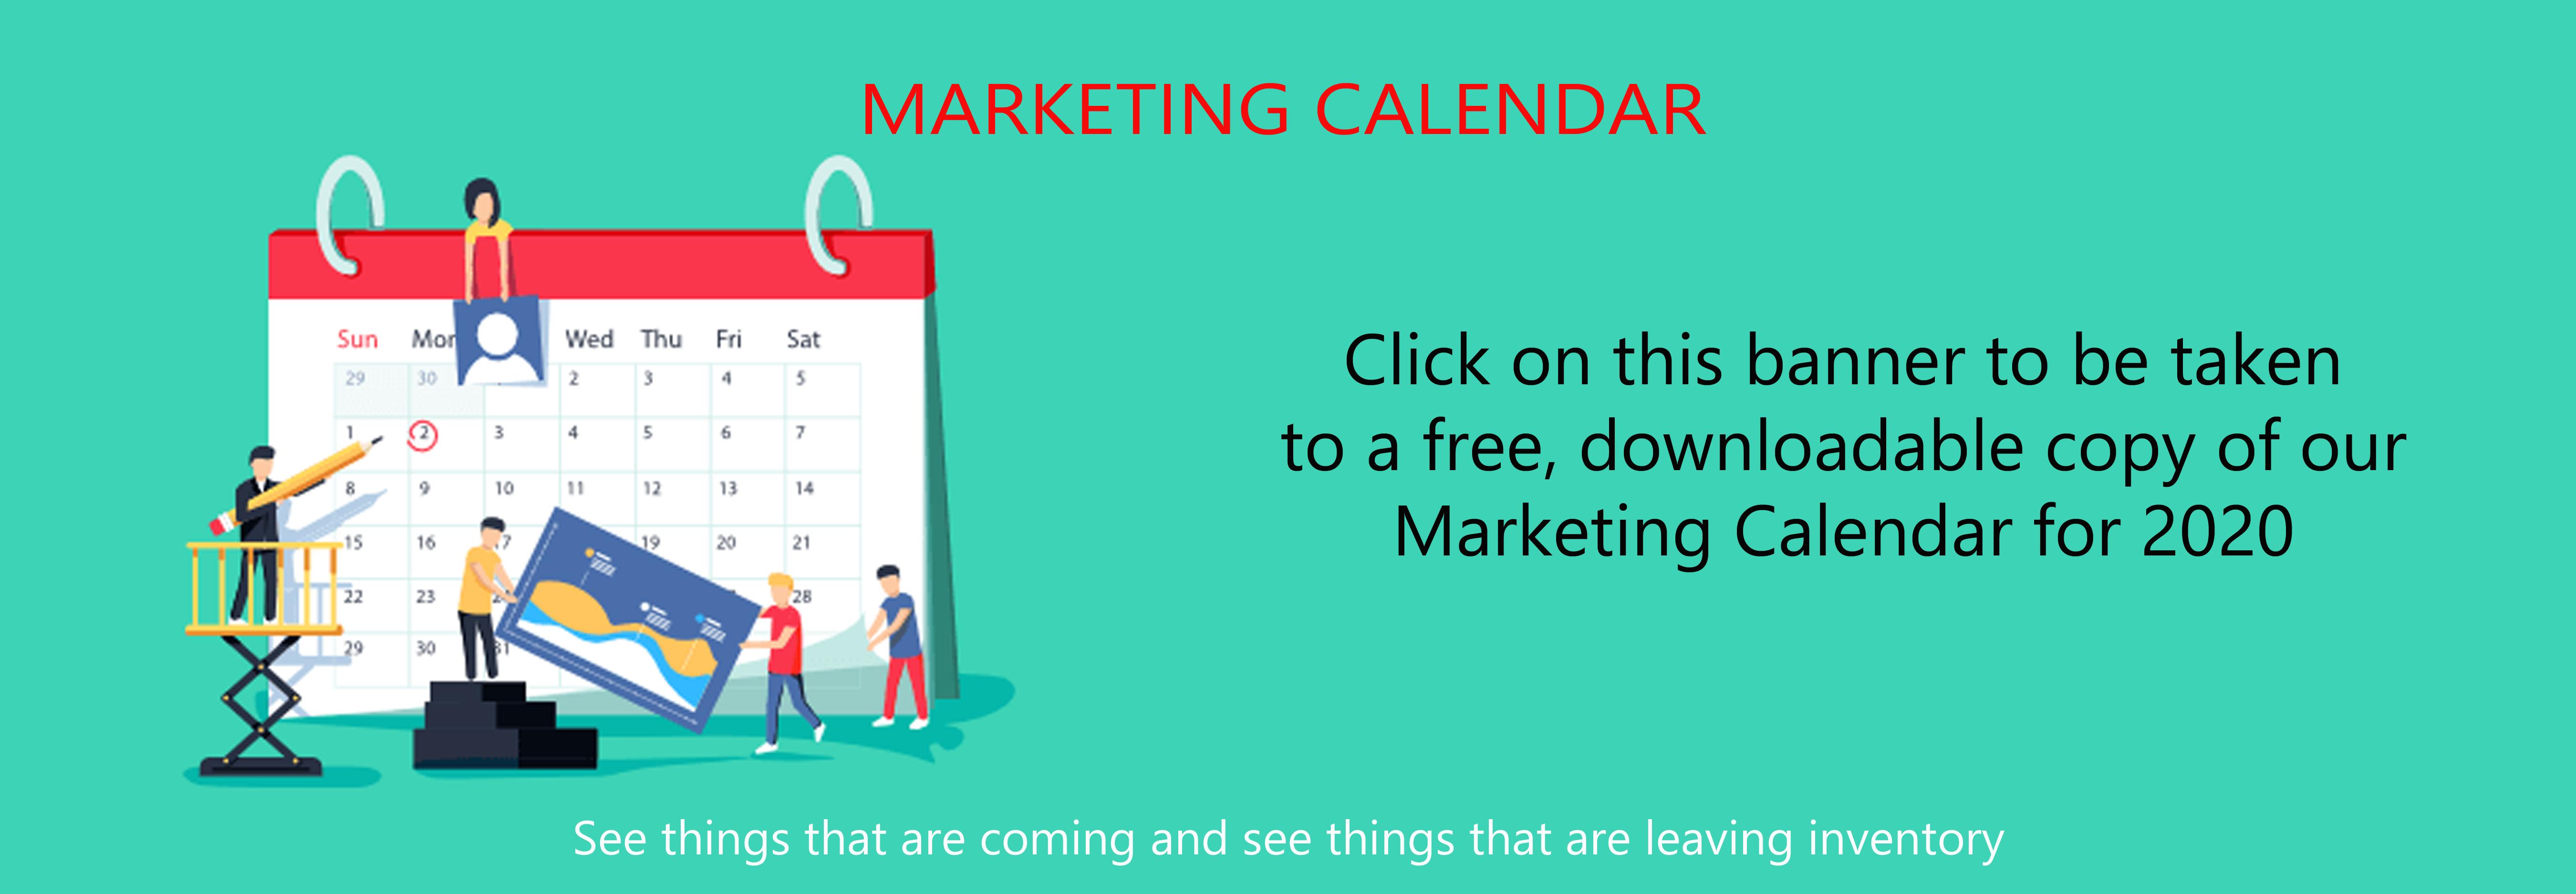 euro pacific marketing calendar